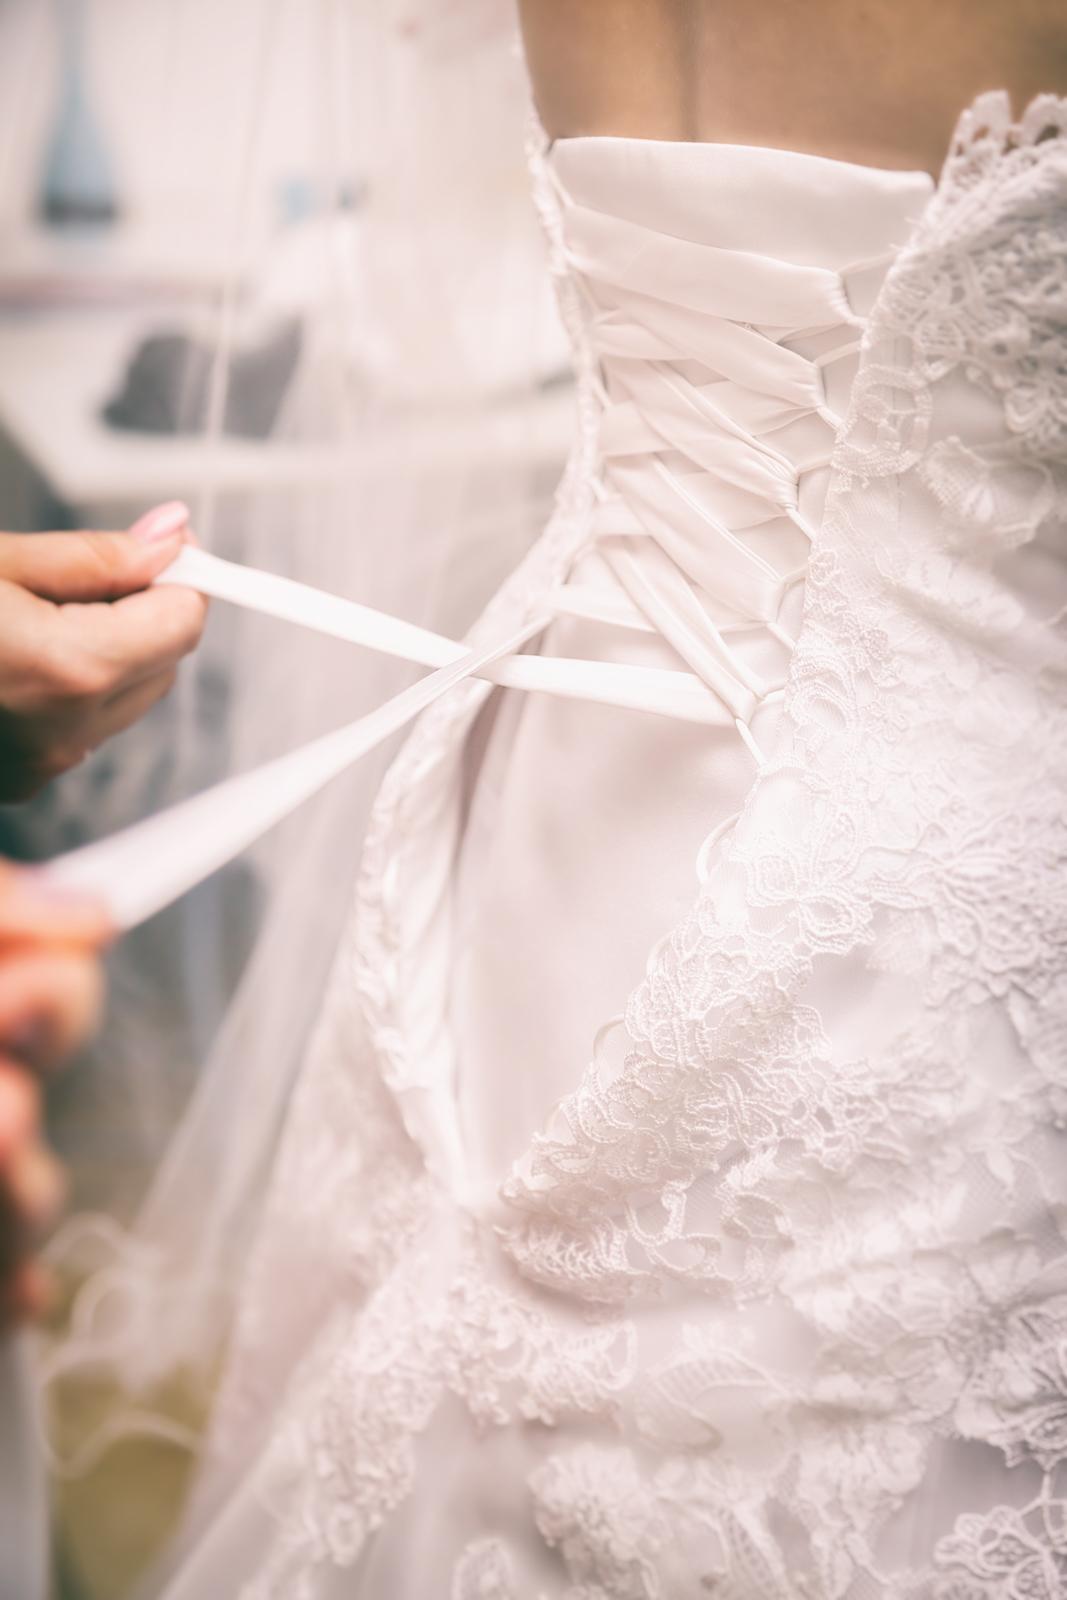 photographe de mariage, habillage de la mariée